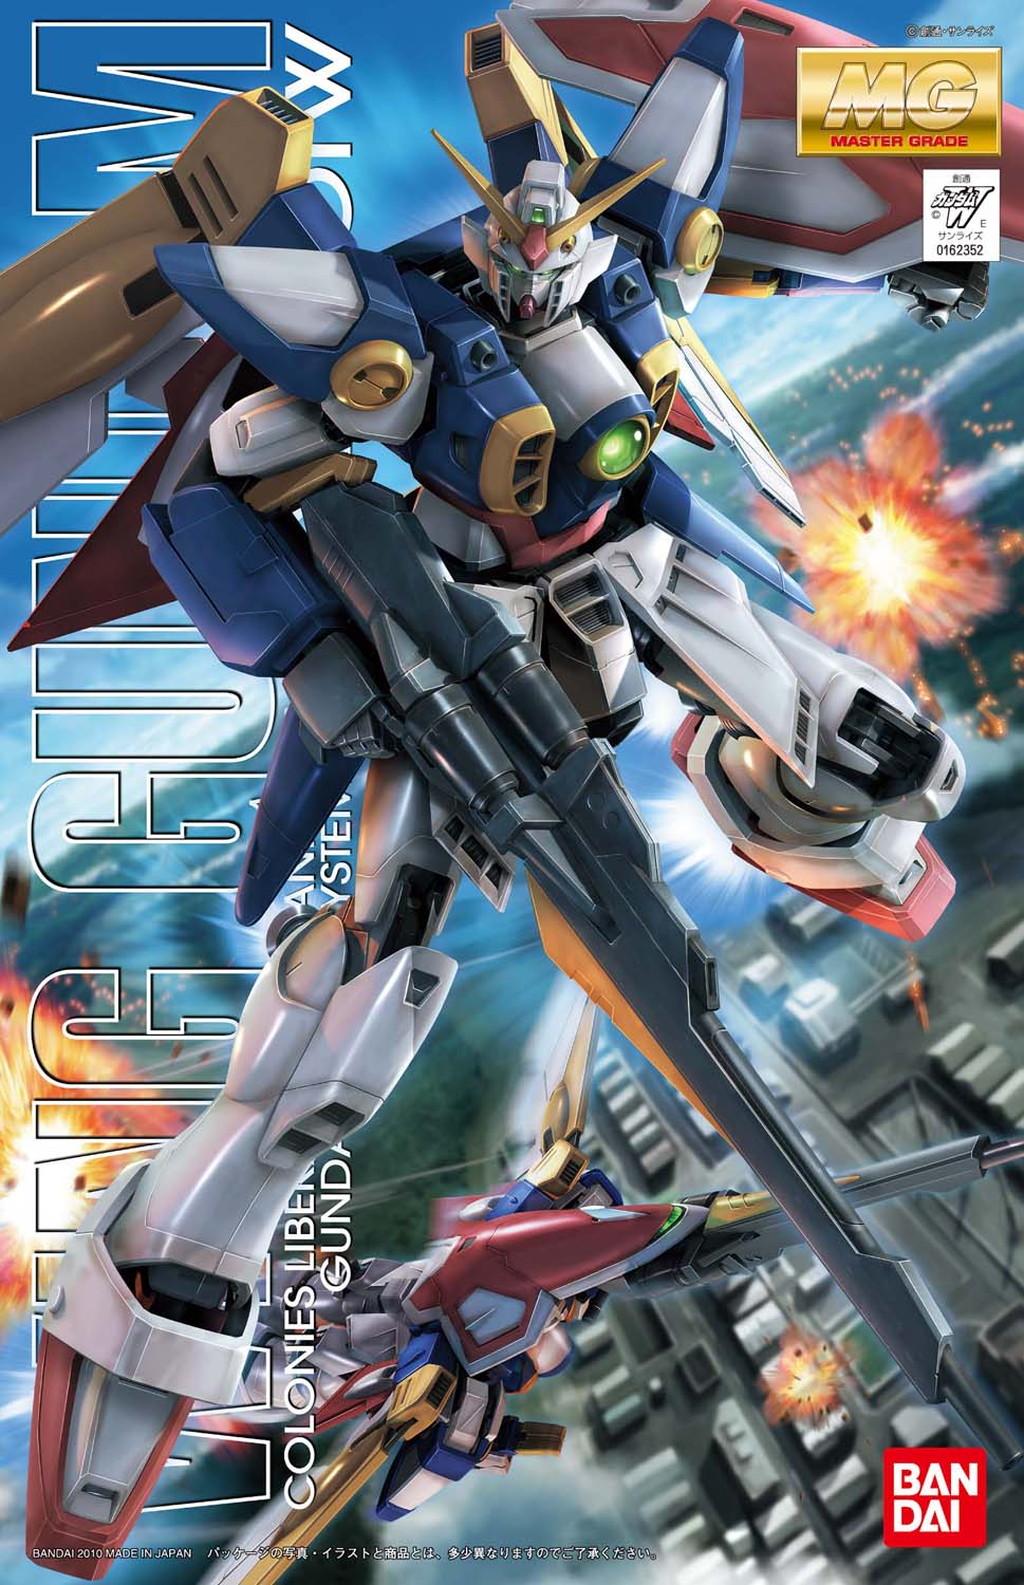 MG 1/100 XXXG-01W ウイングガンダム [Wing Gundam] 0162352 4543112623522